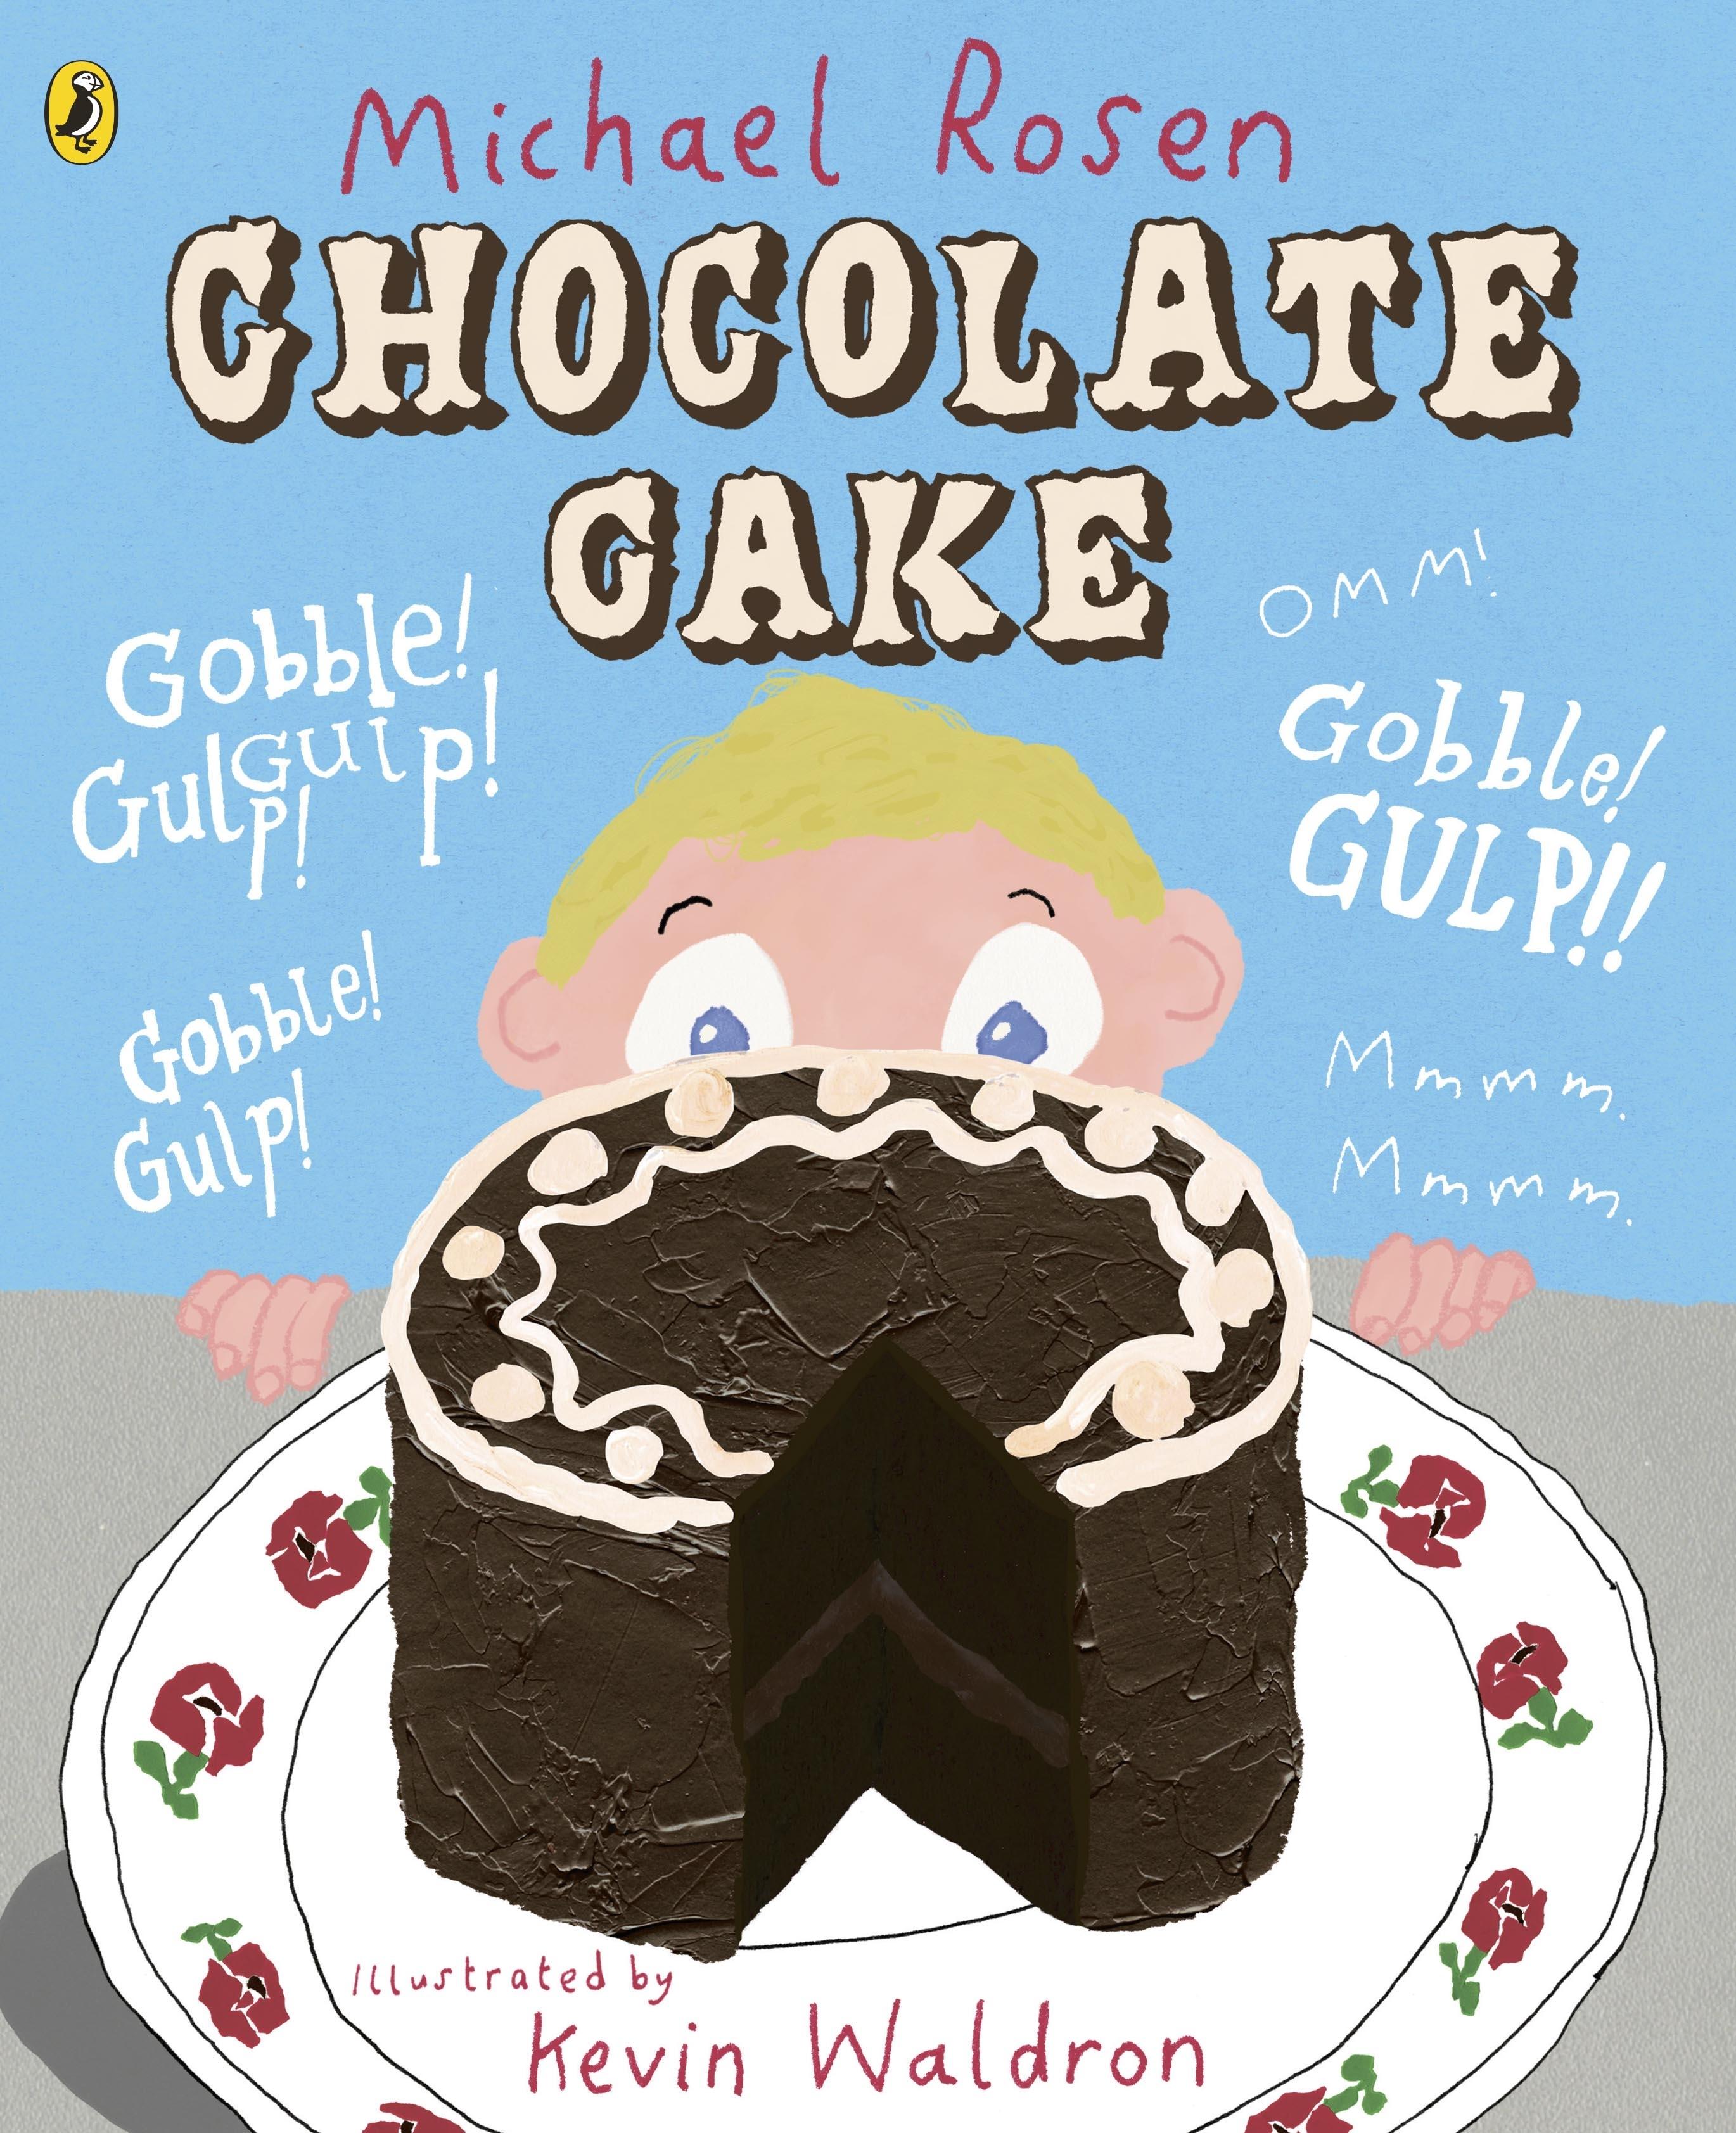 Chocolate Cake Michael Rosen Funny